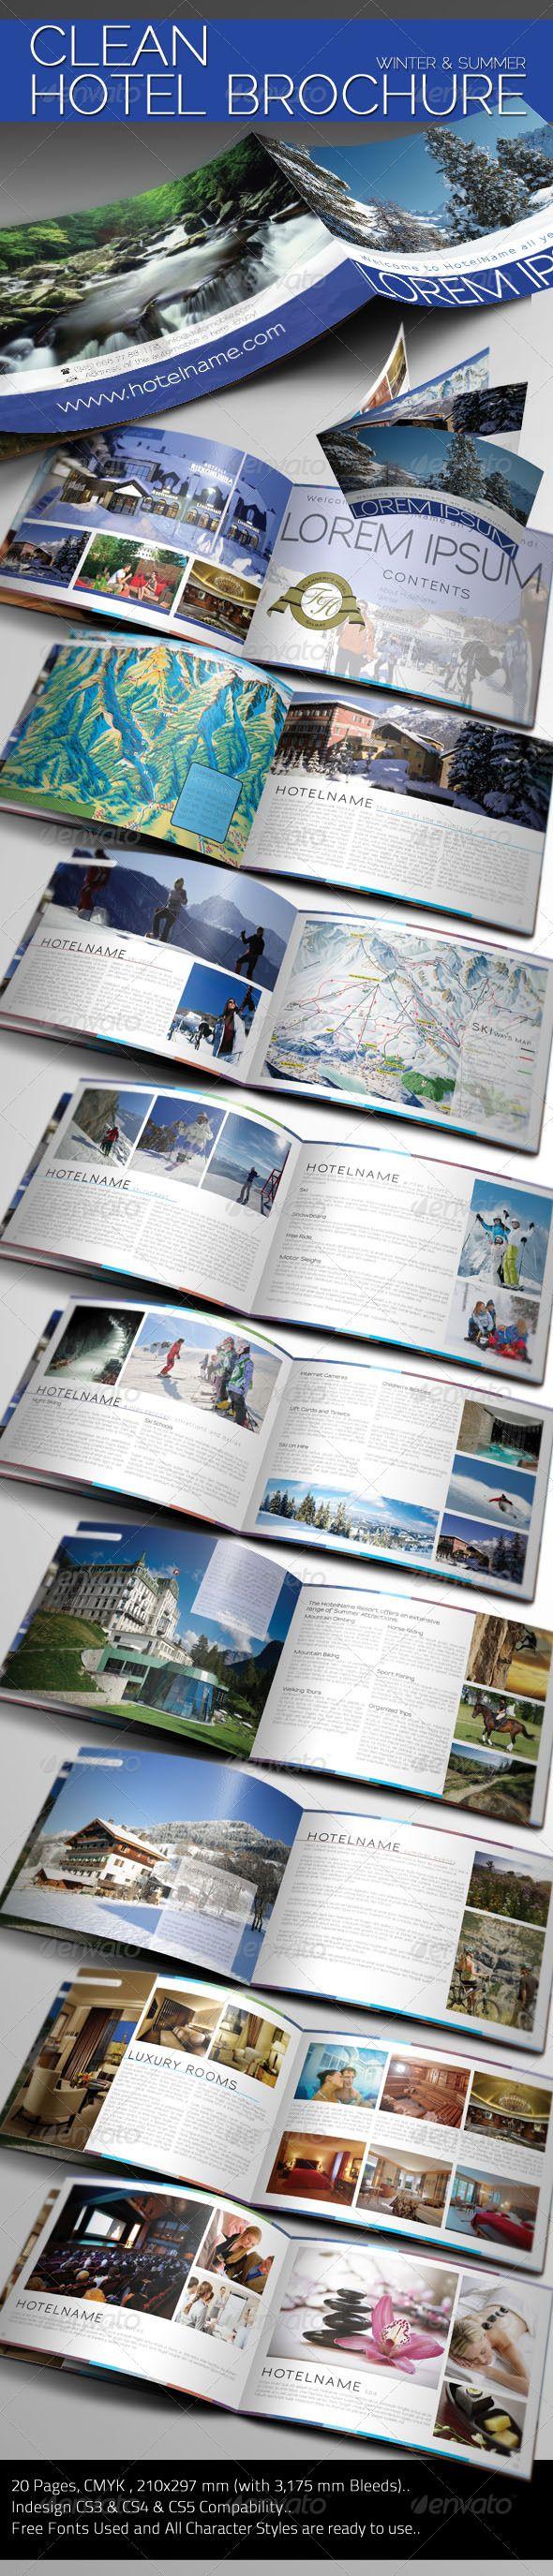 Clean Hotel Brochure - Corporate Brochures